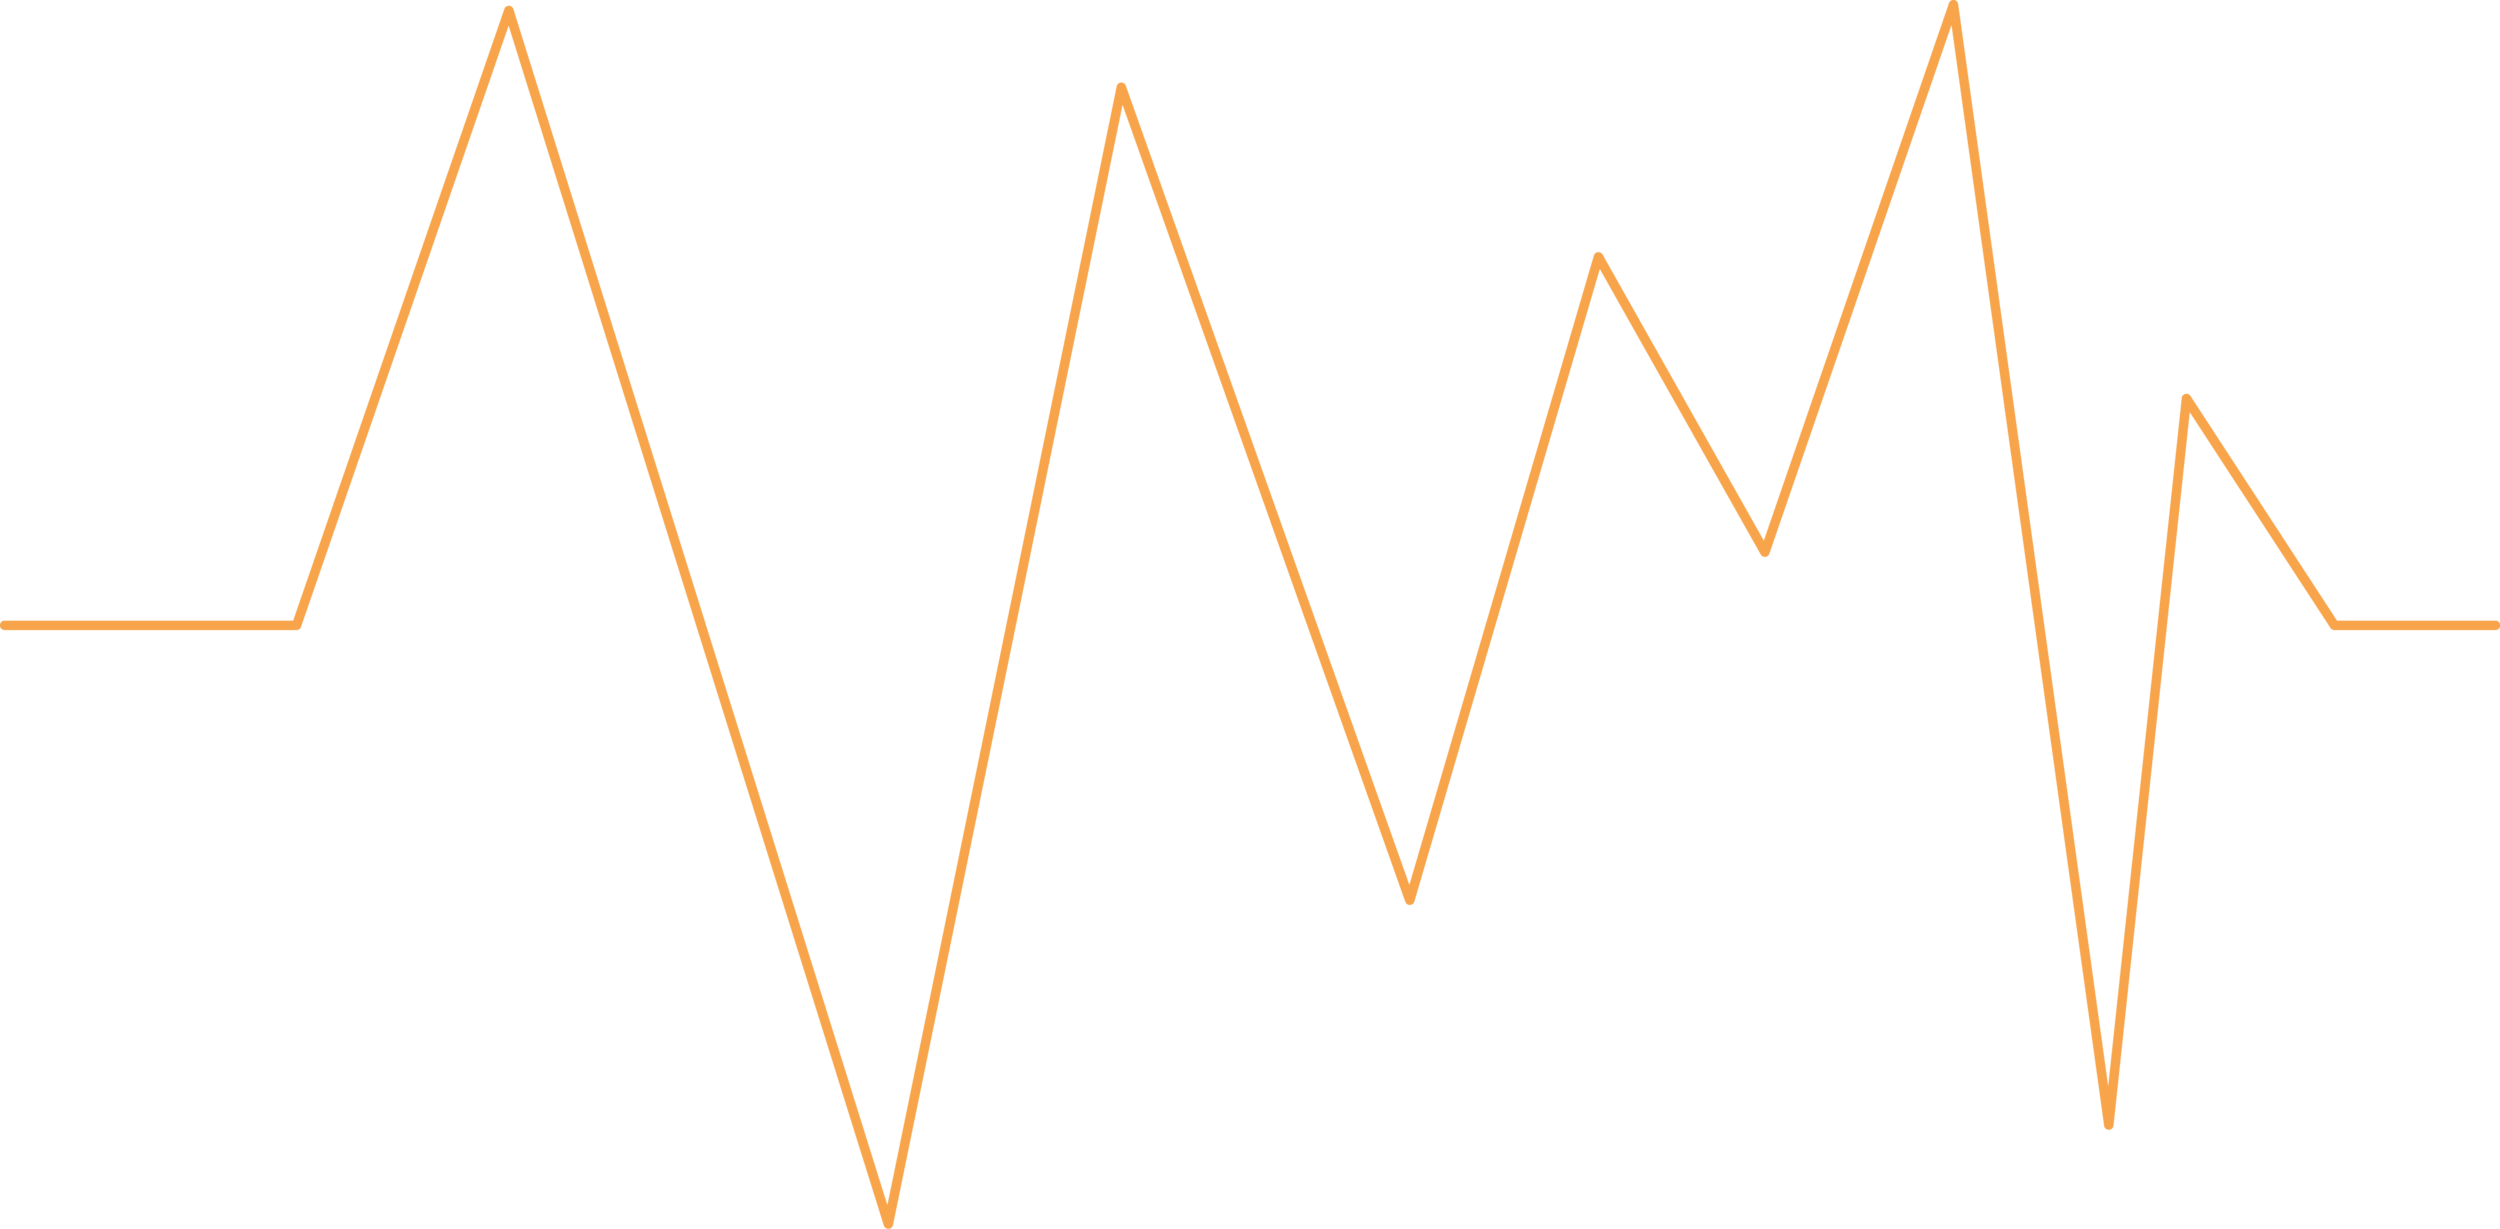 ApolloProductionsDj - orange zig zag. Transparent background..png